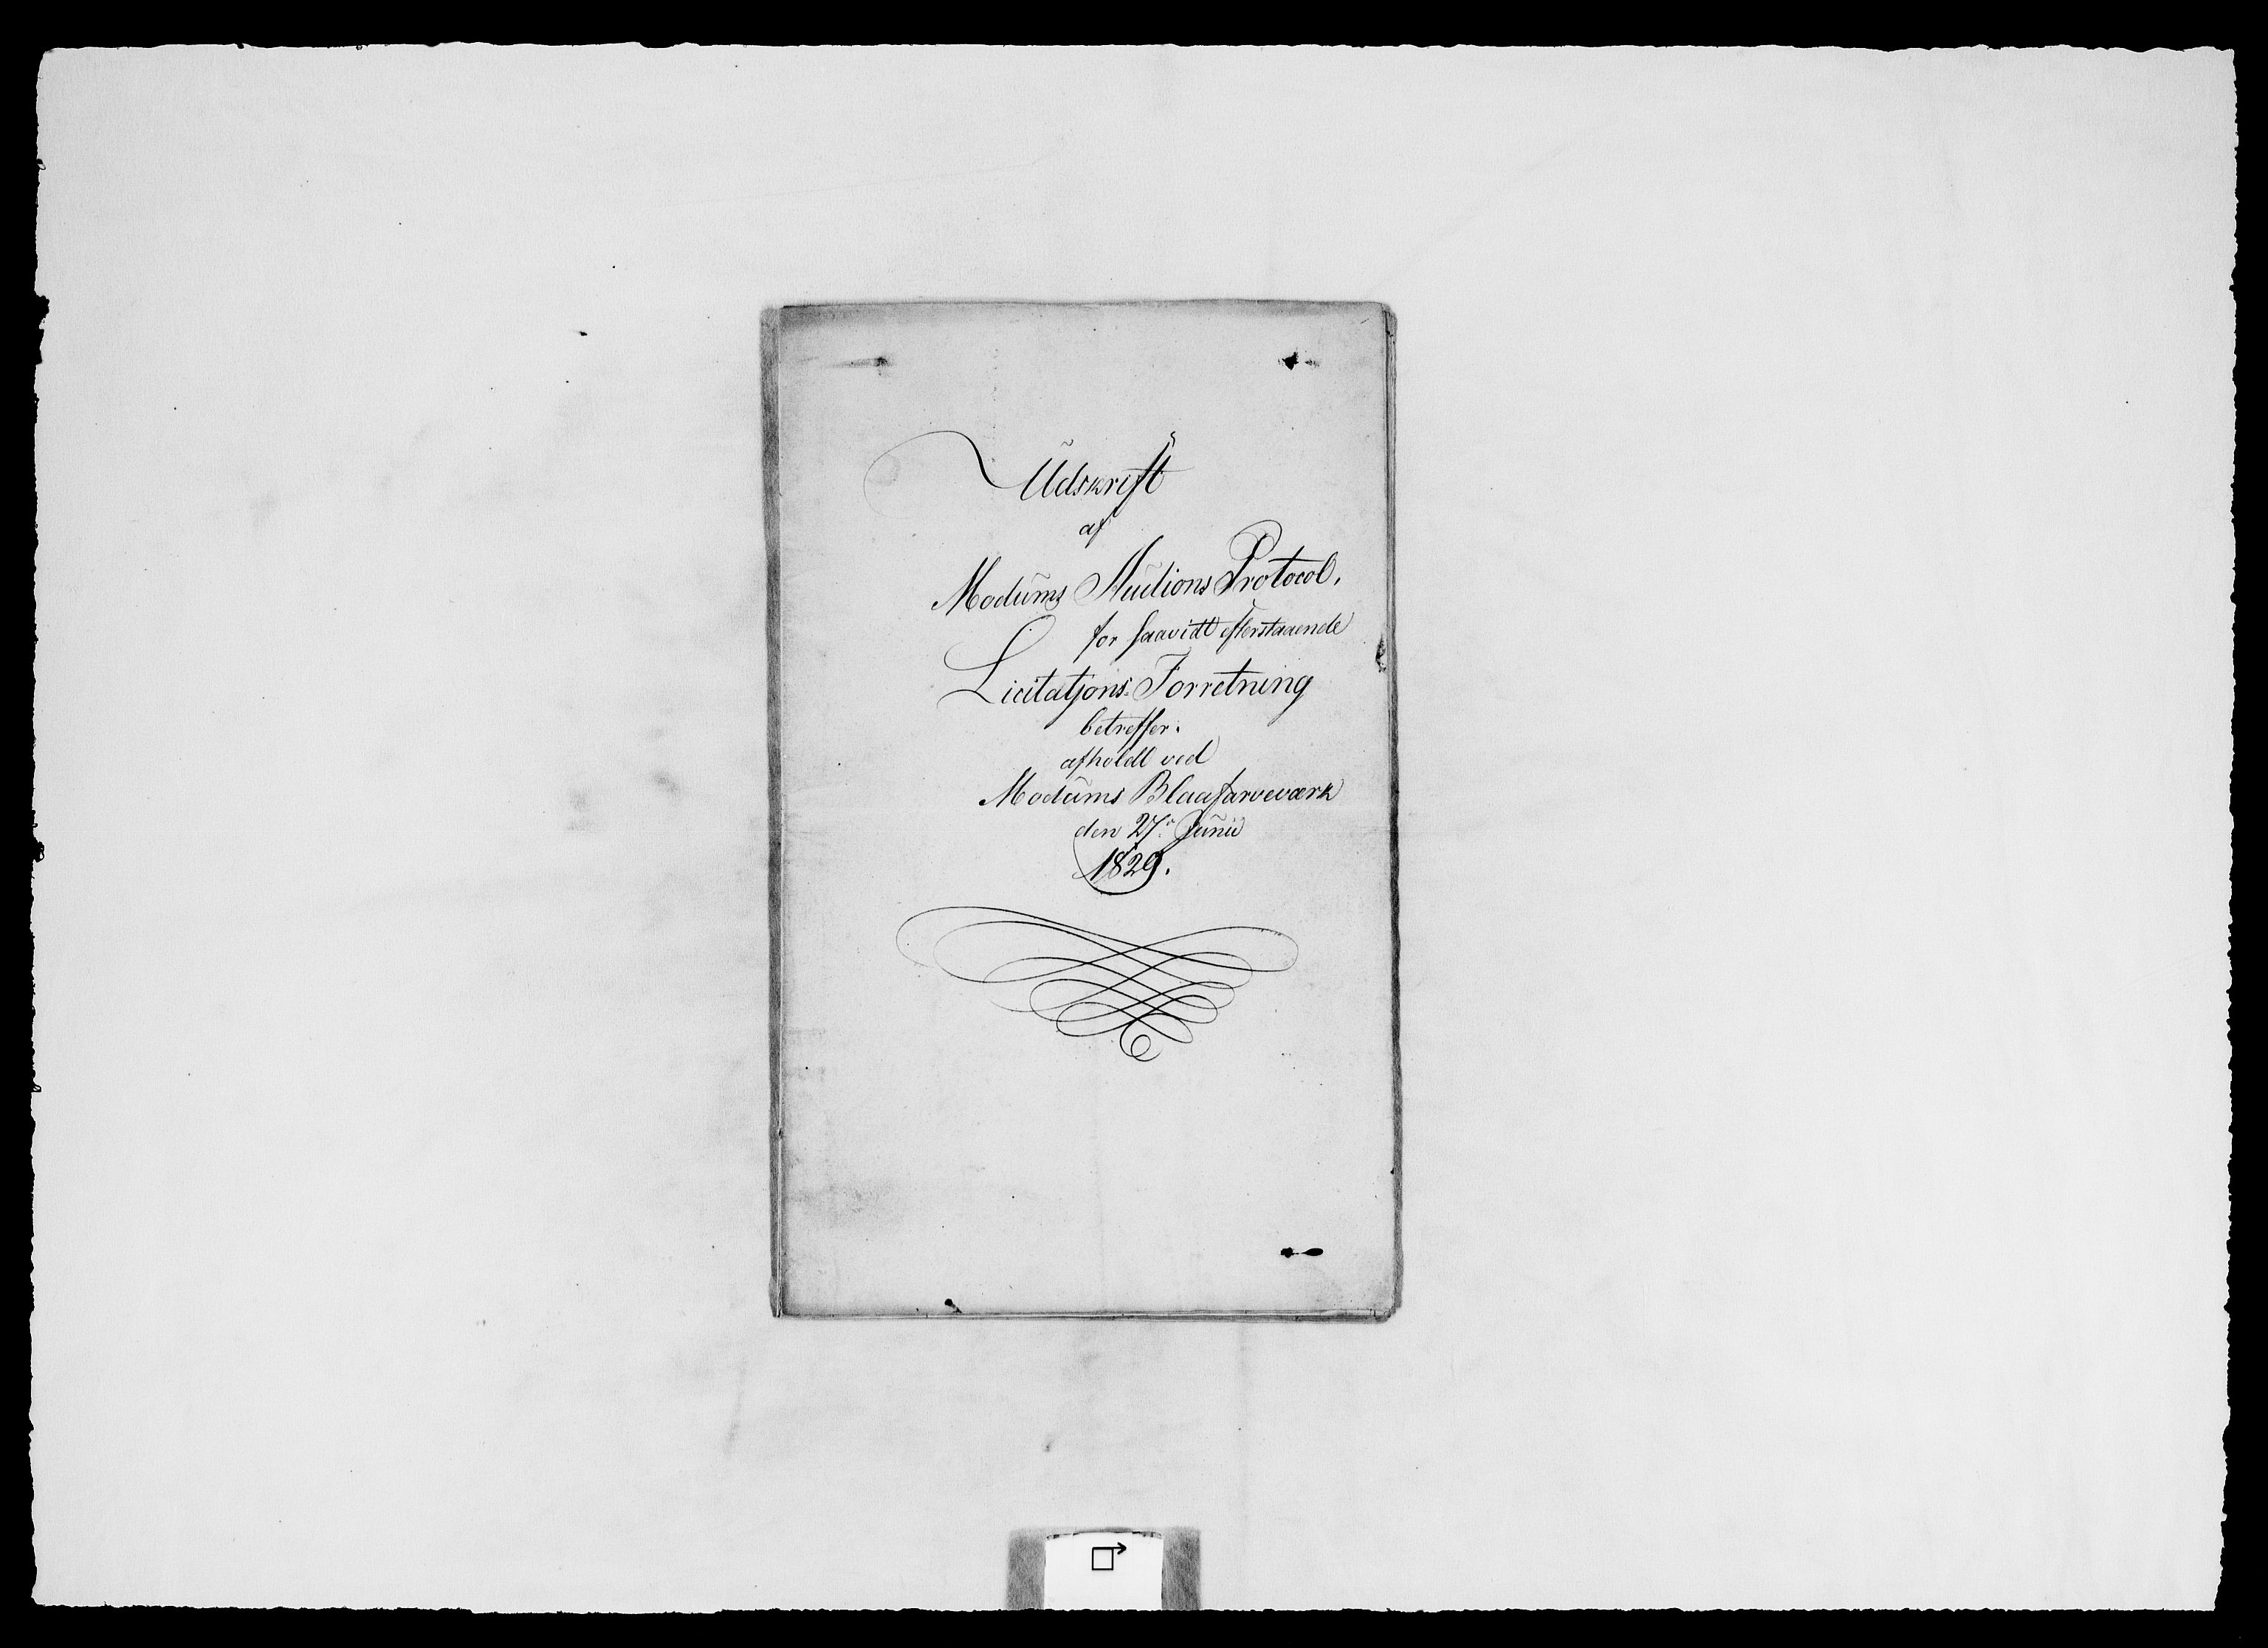 RA, Modums Blaafarveværk, G/Ga/L0063, 1827-1849, s. 90